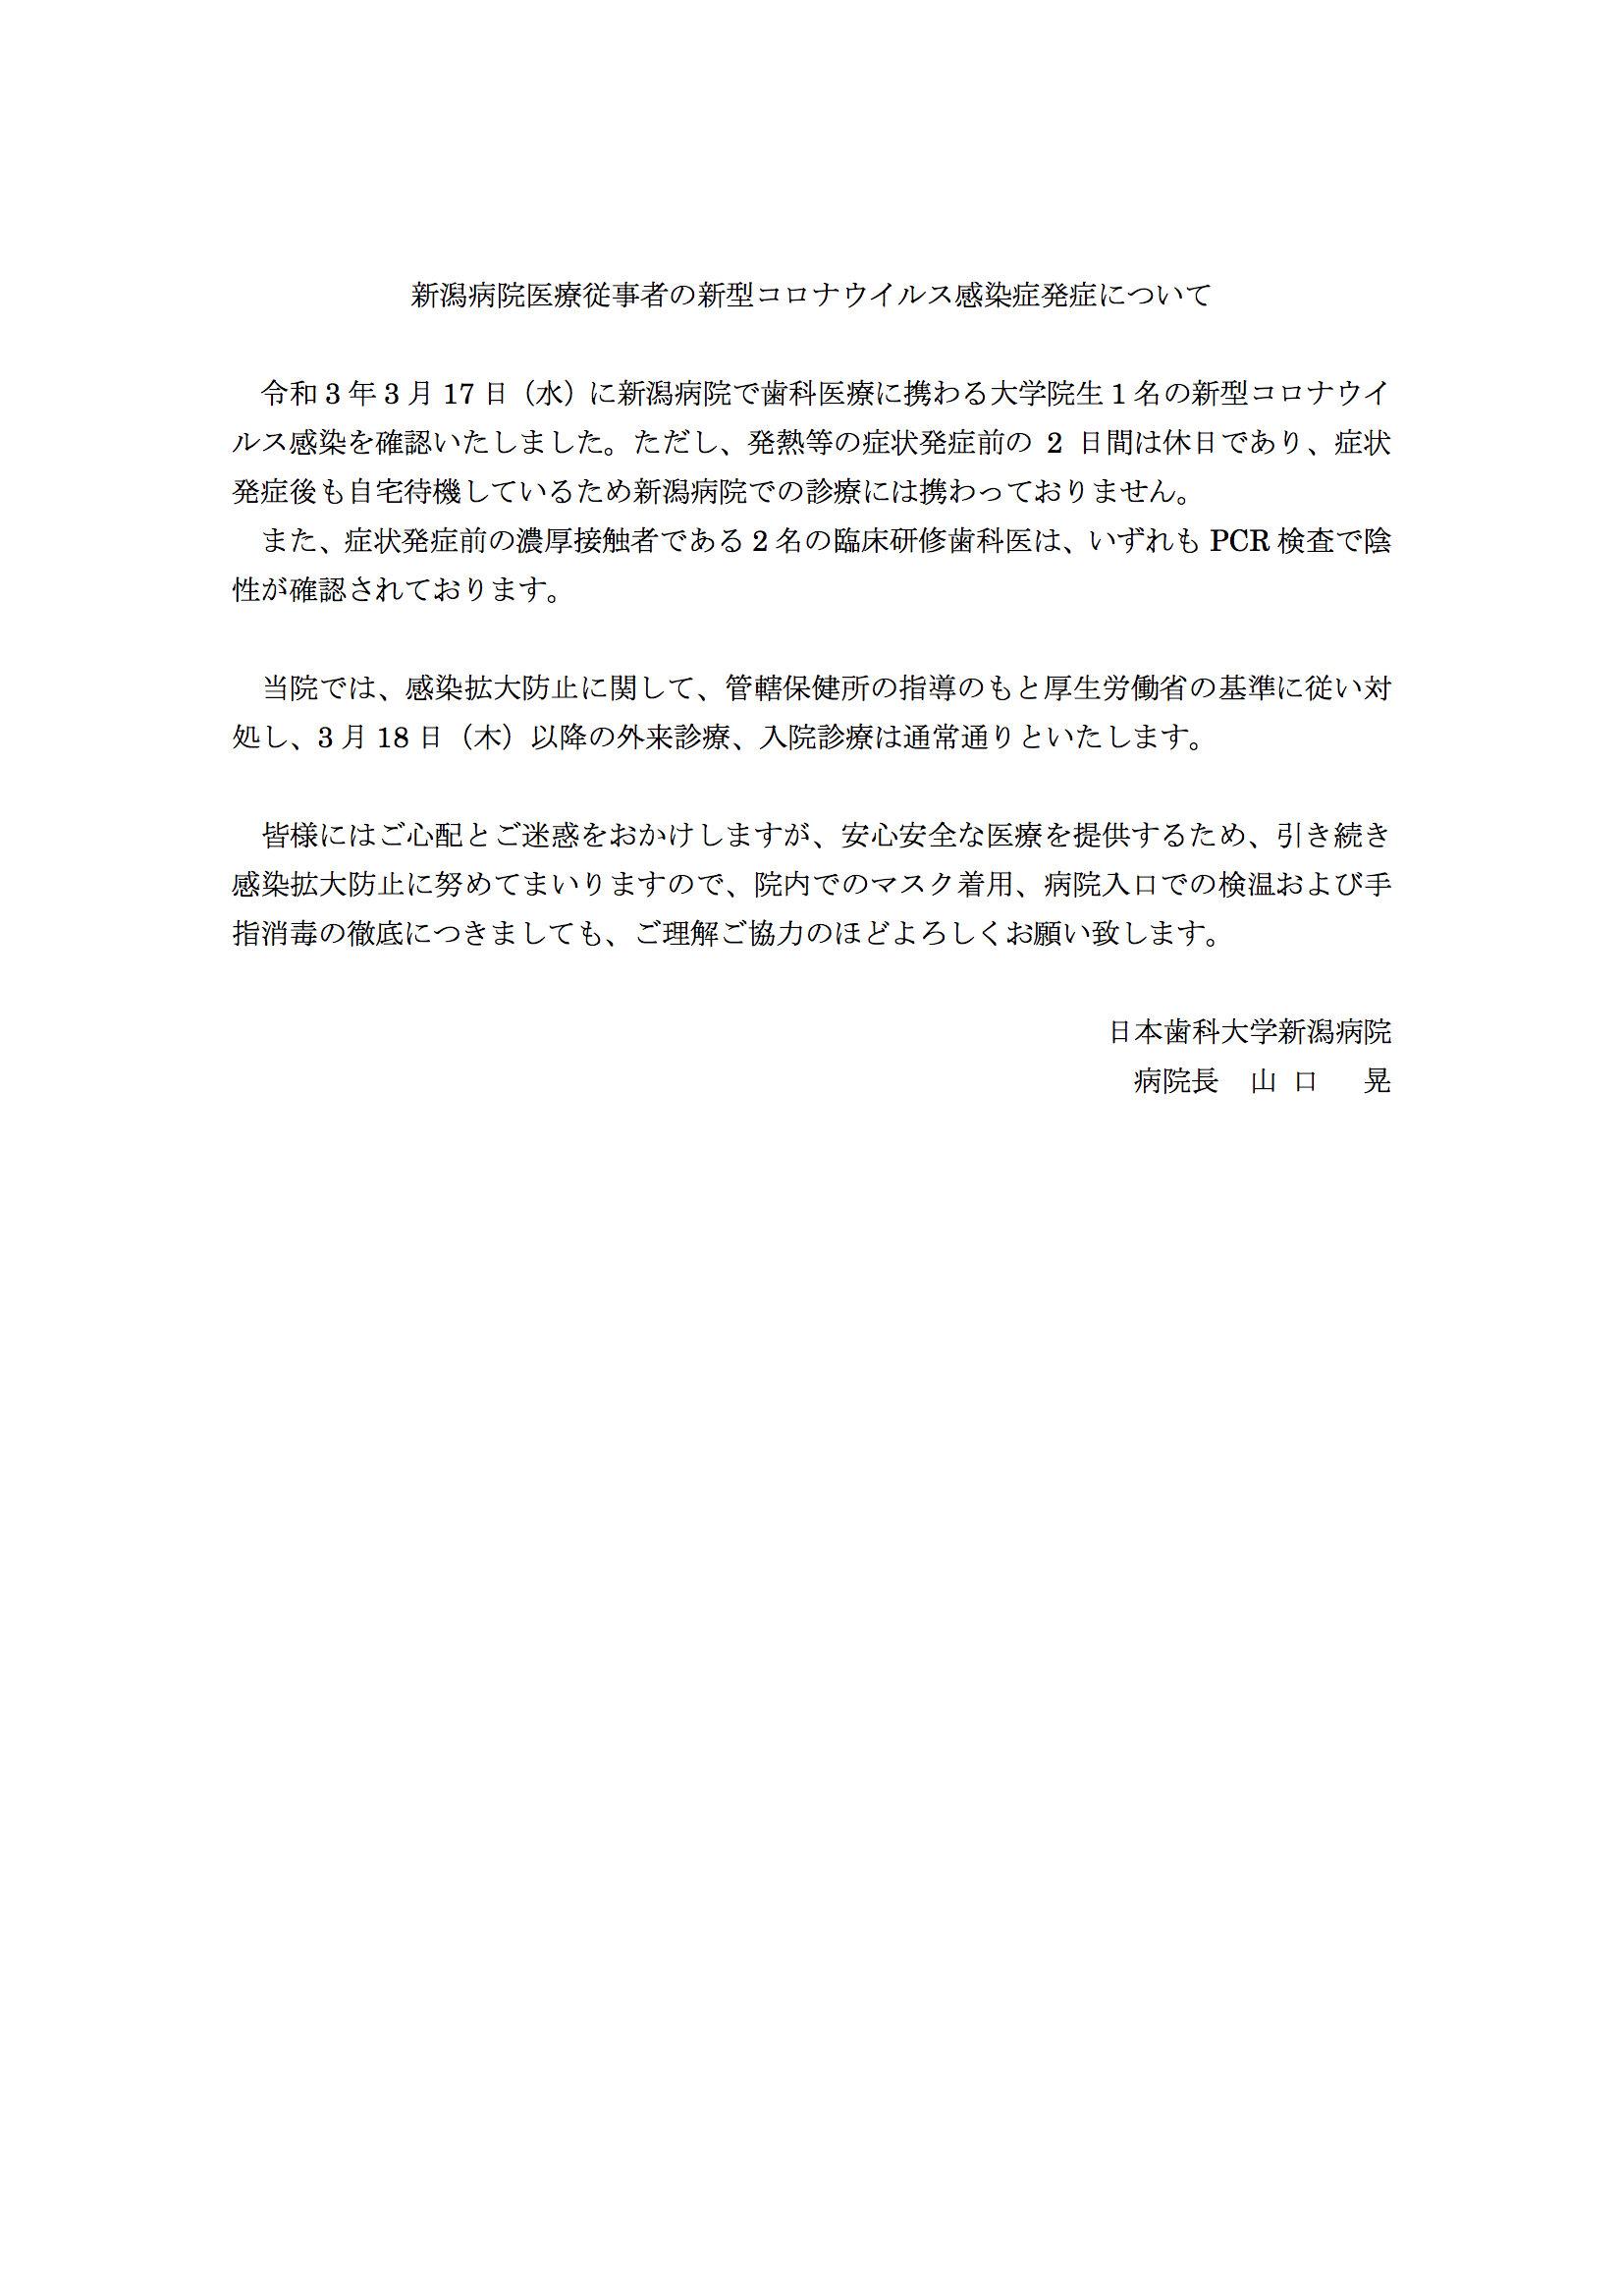 http://www.ngt.ndu.ac.jp/hospital/dental/info/dfeeef20421068b8ef2f2f8010f54abfecea5943.jpg